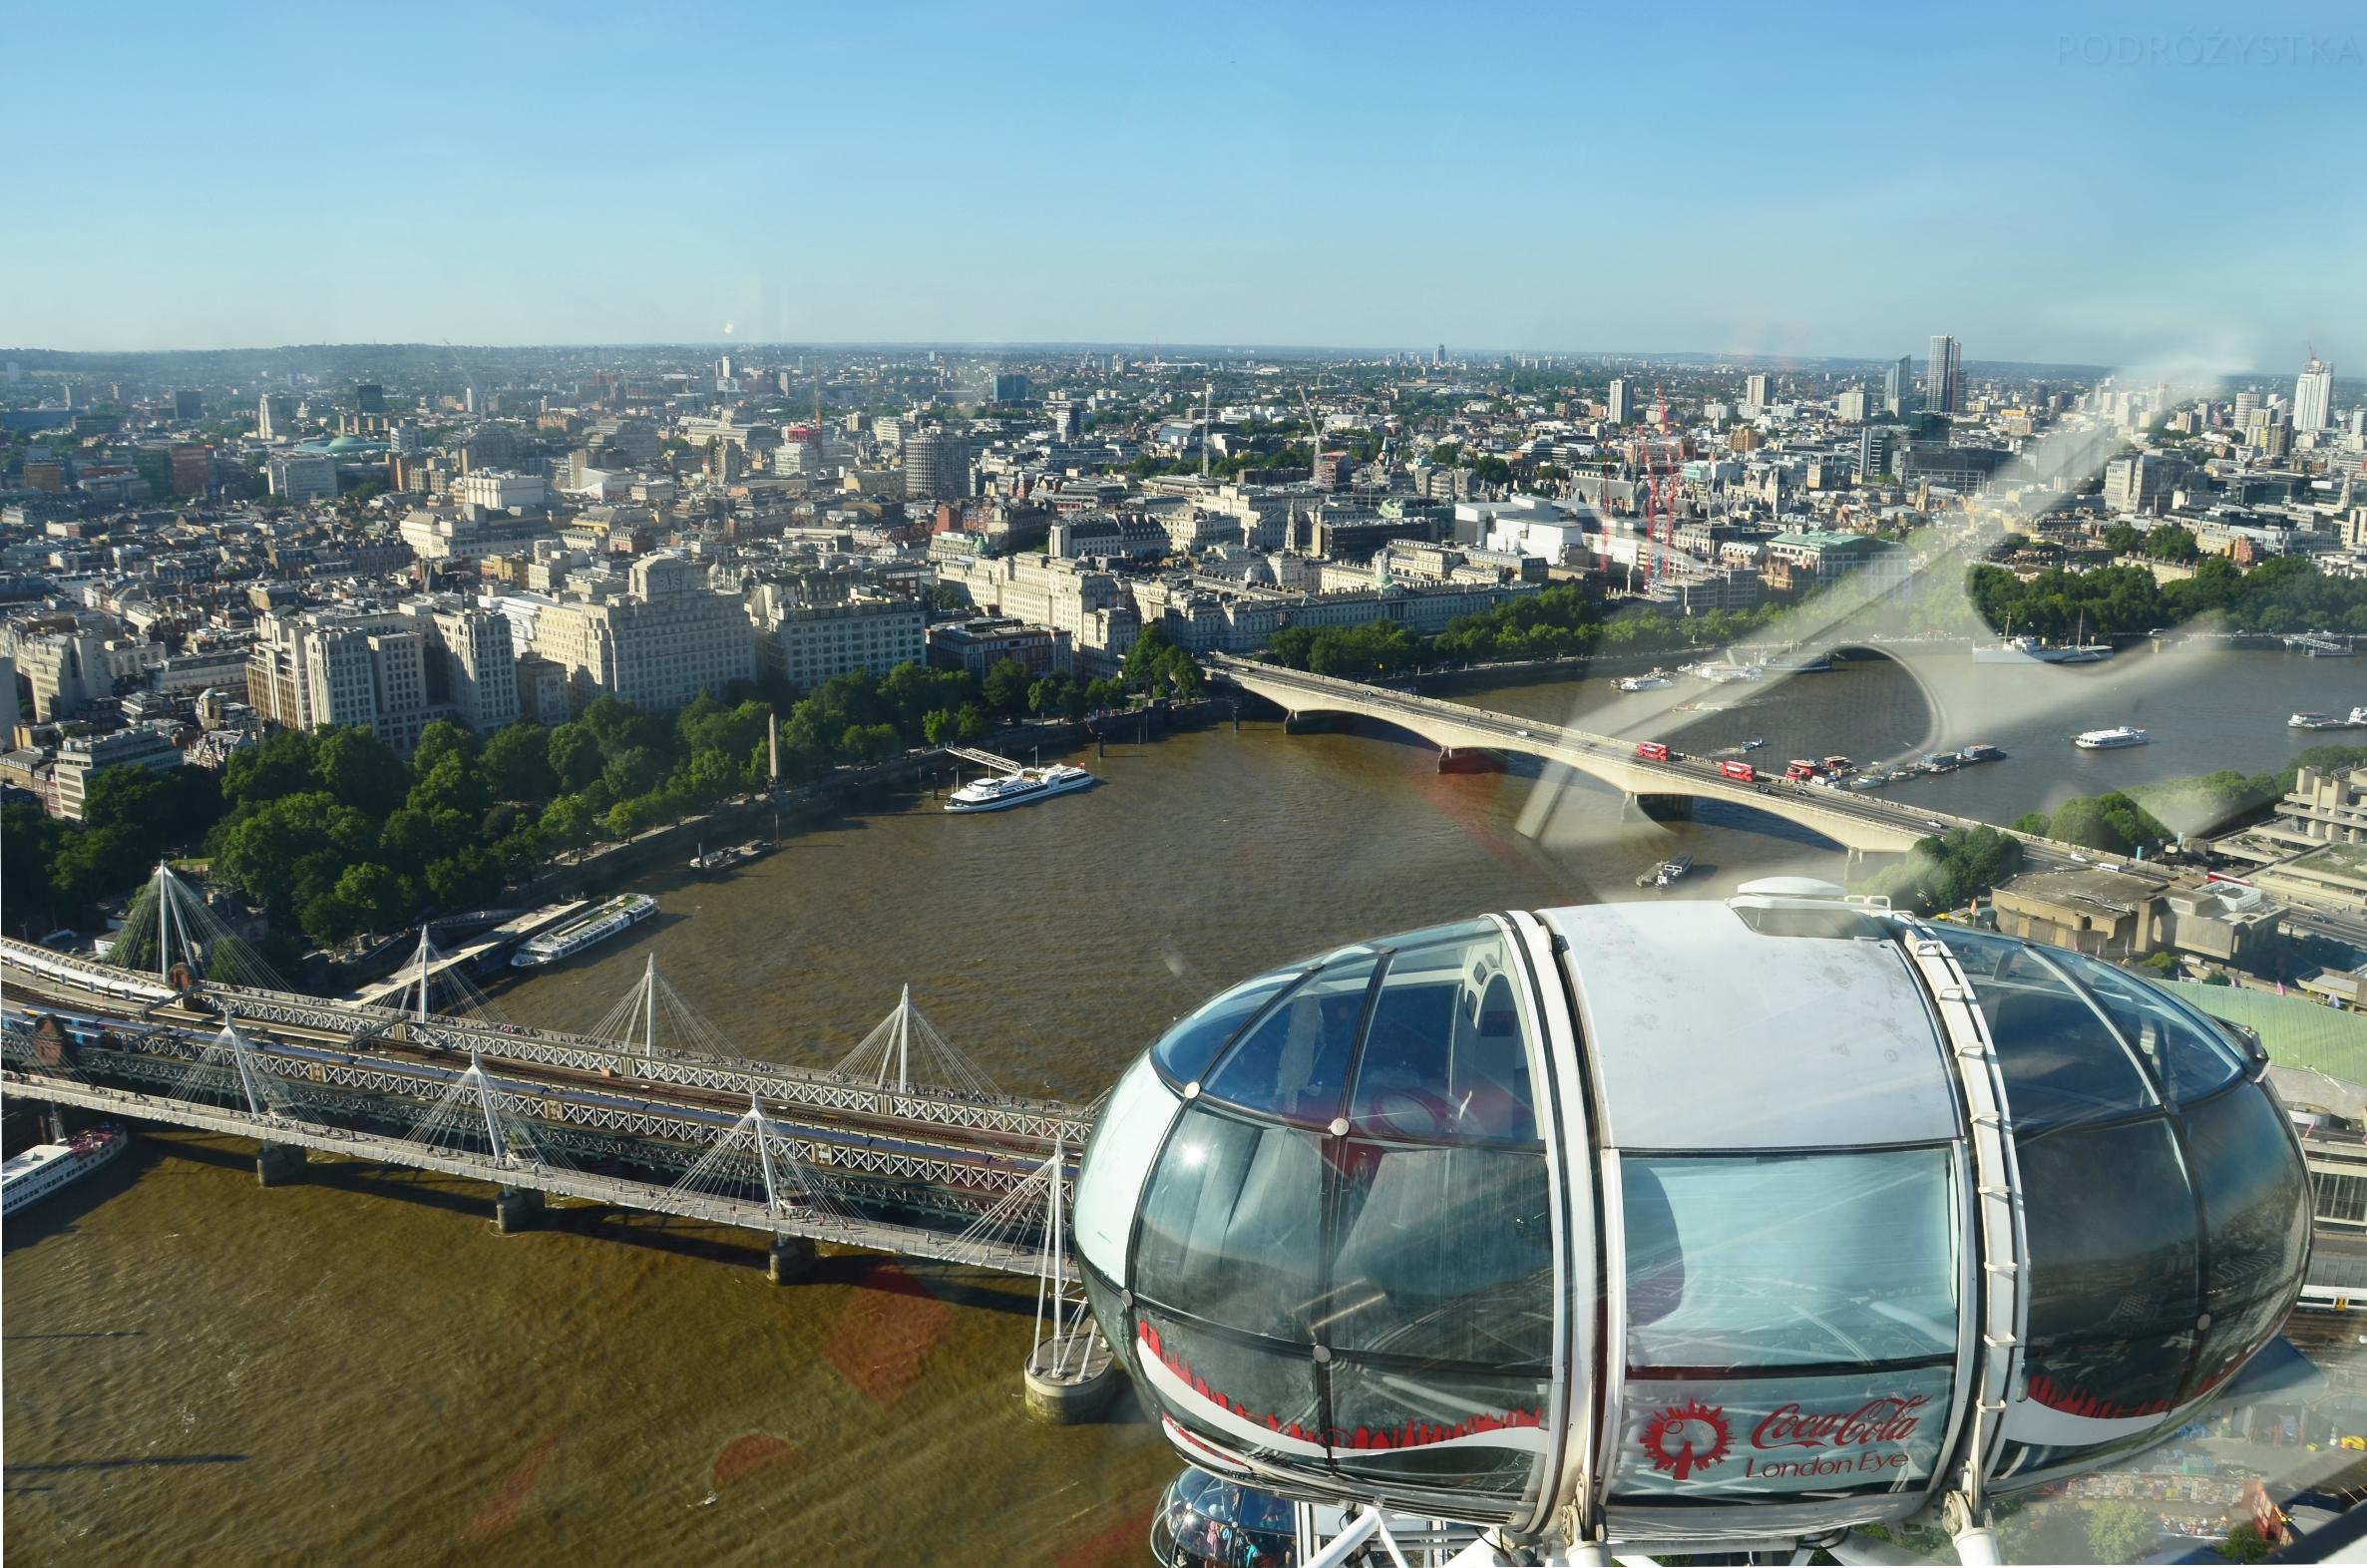 UK_III_20_London_Eye_London_view_over_Thames_river_50_size_watermark